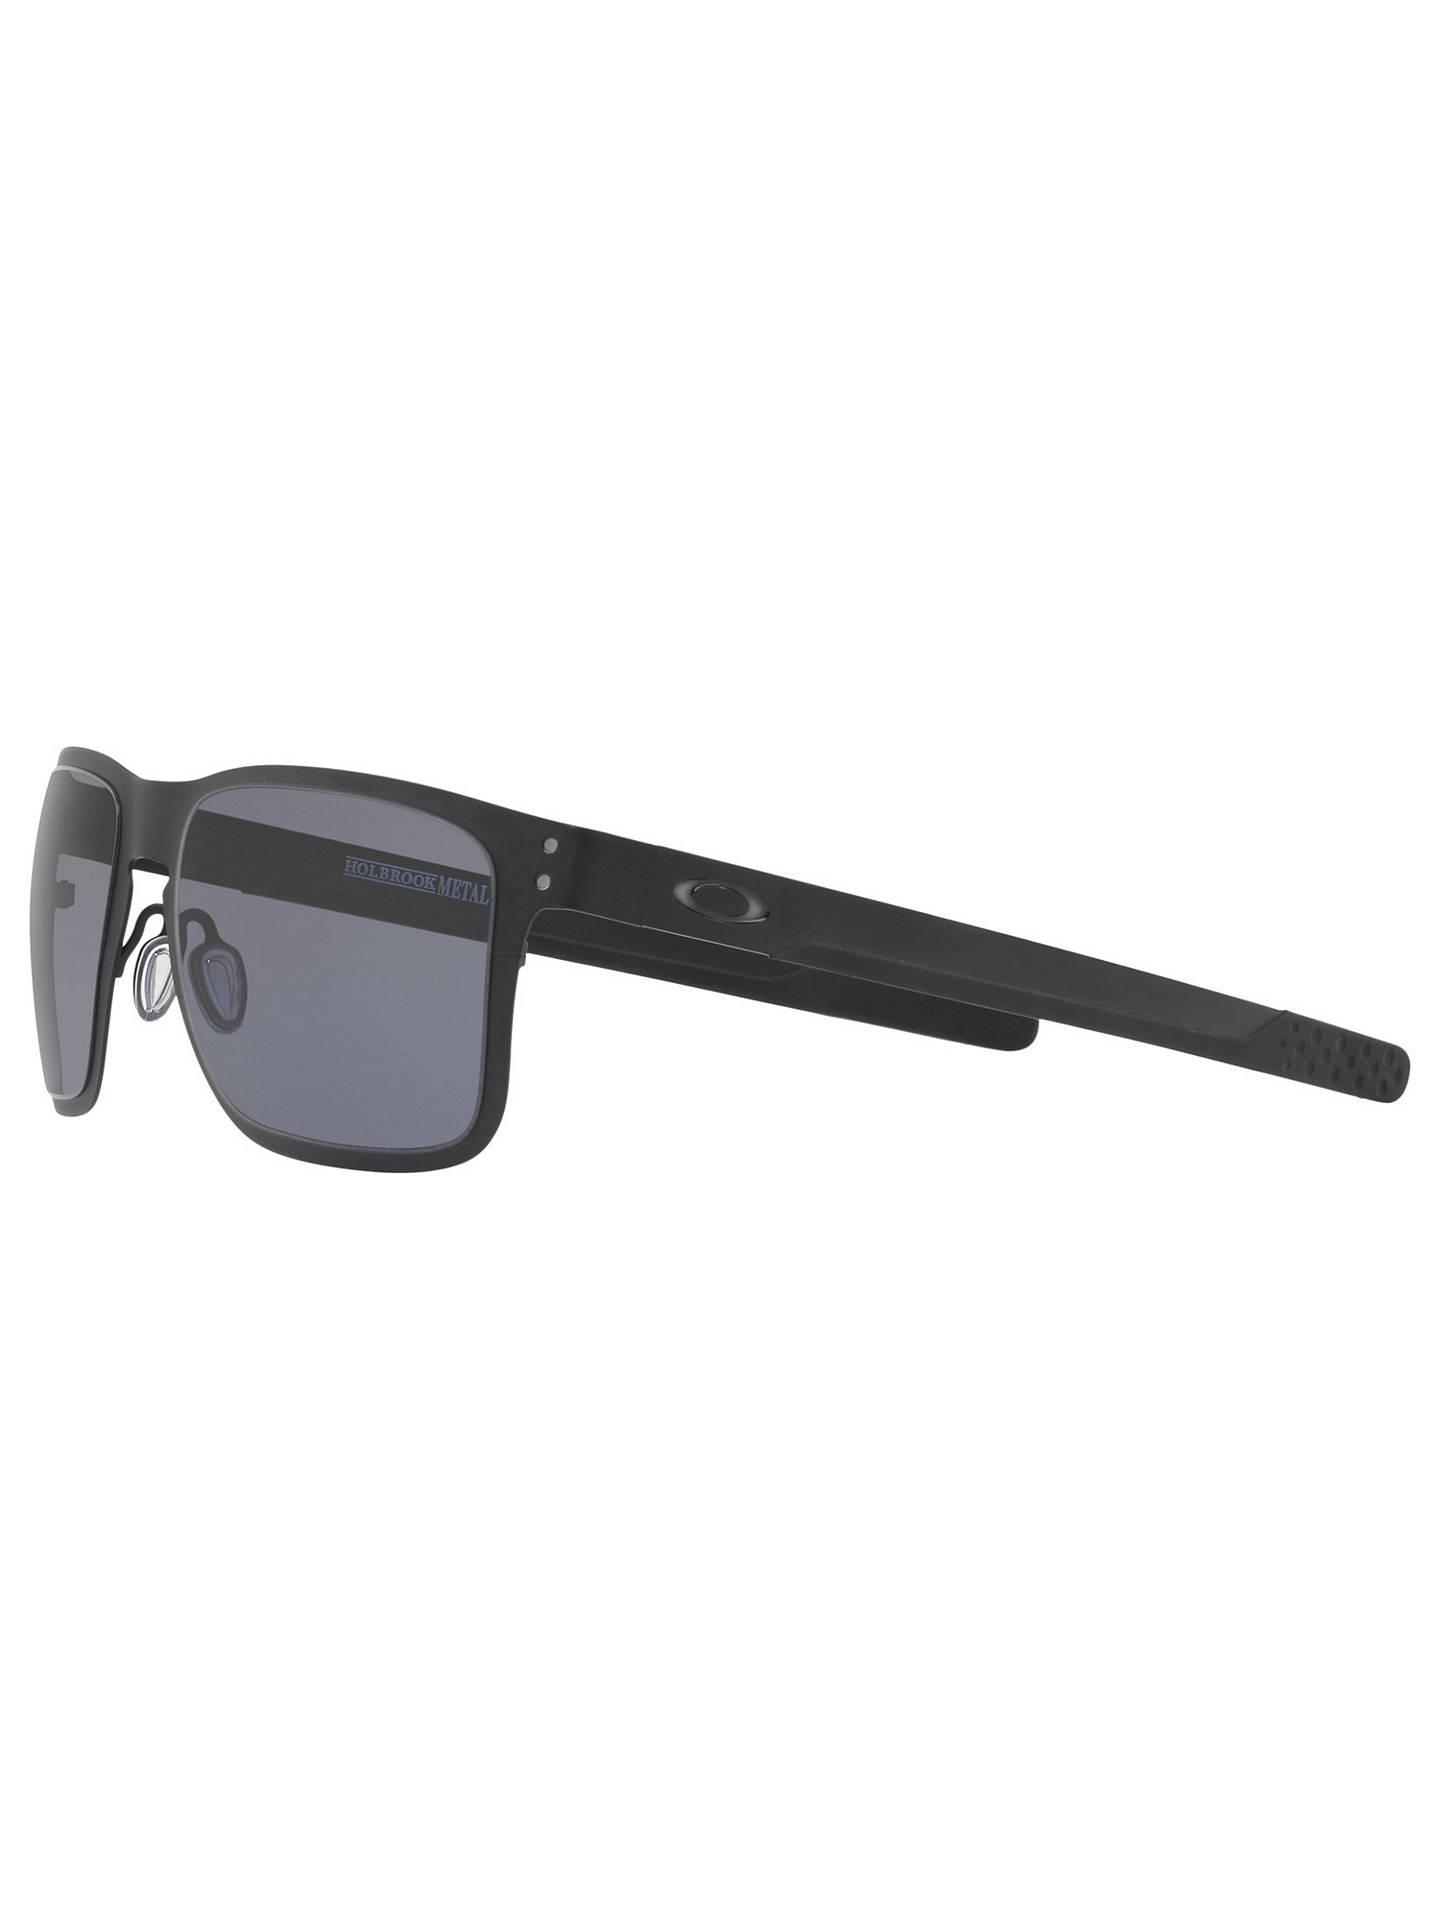 0d8ab4d851 Oakley OO4123 Men s Holbrook Metal Square Sunglasses at John Lewis ...